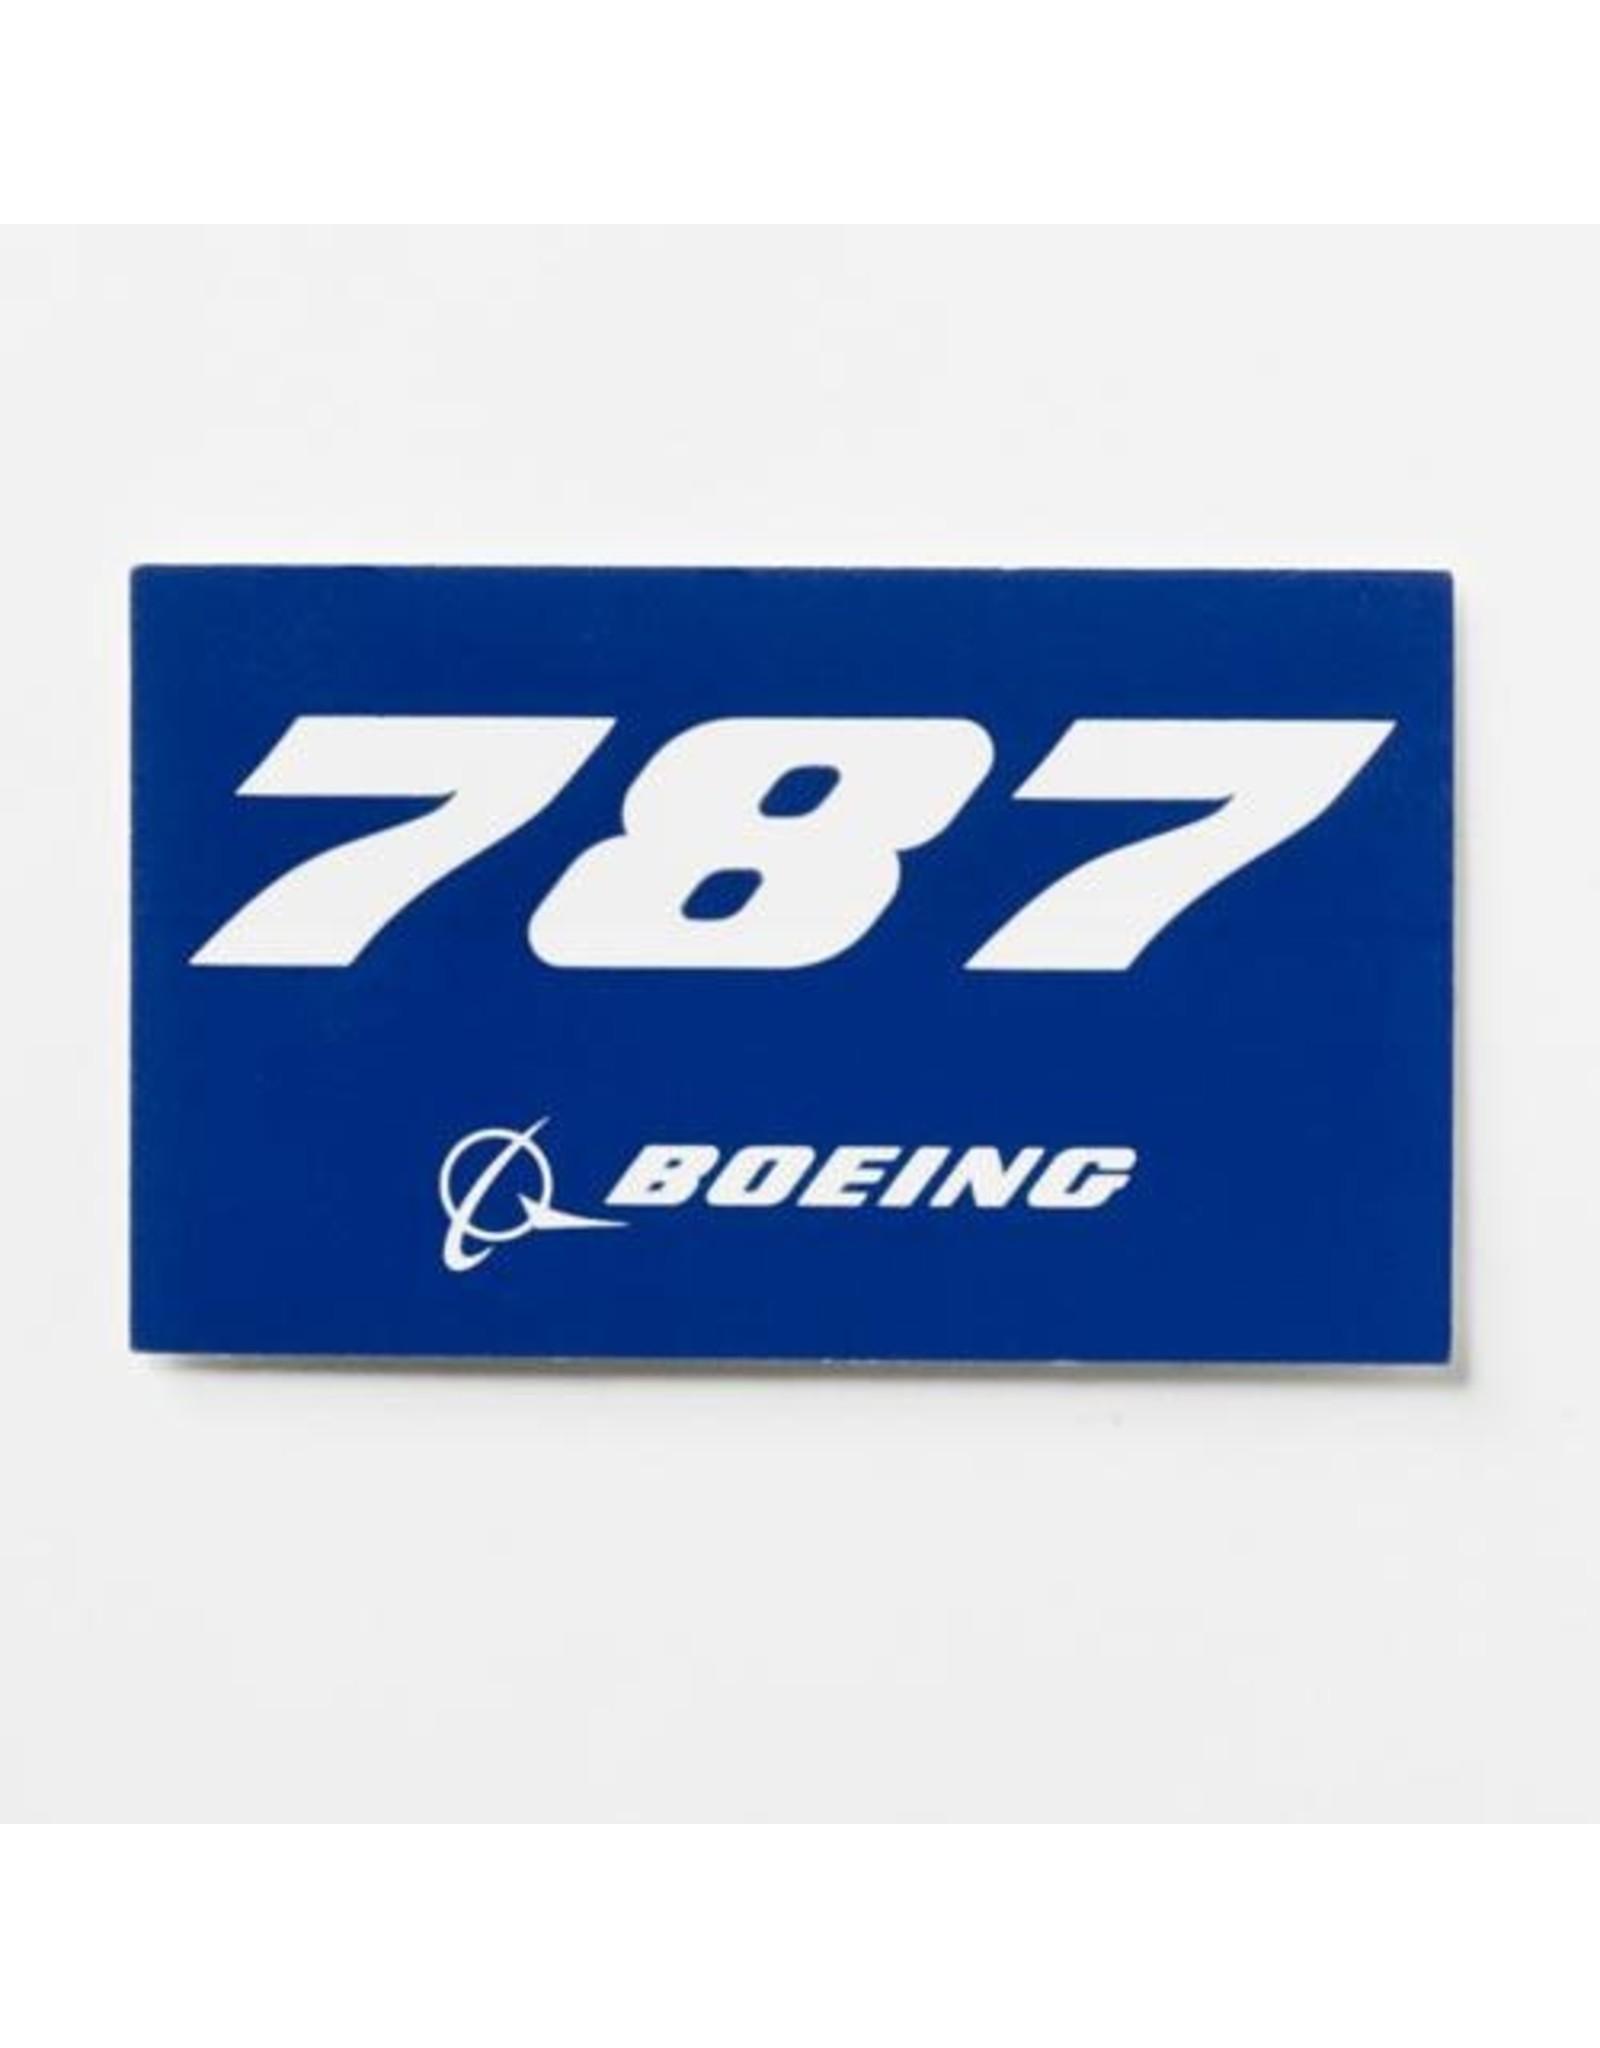 Sticker 787 rectangle